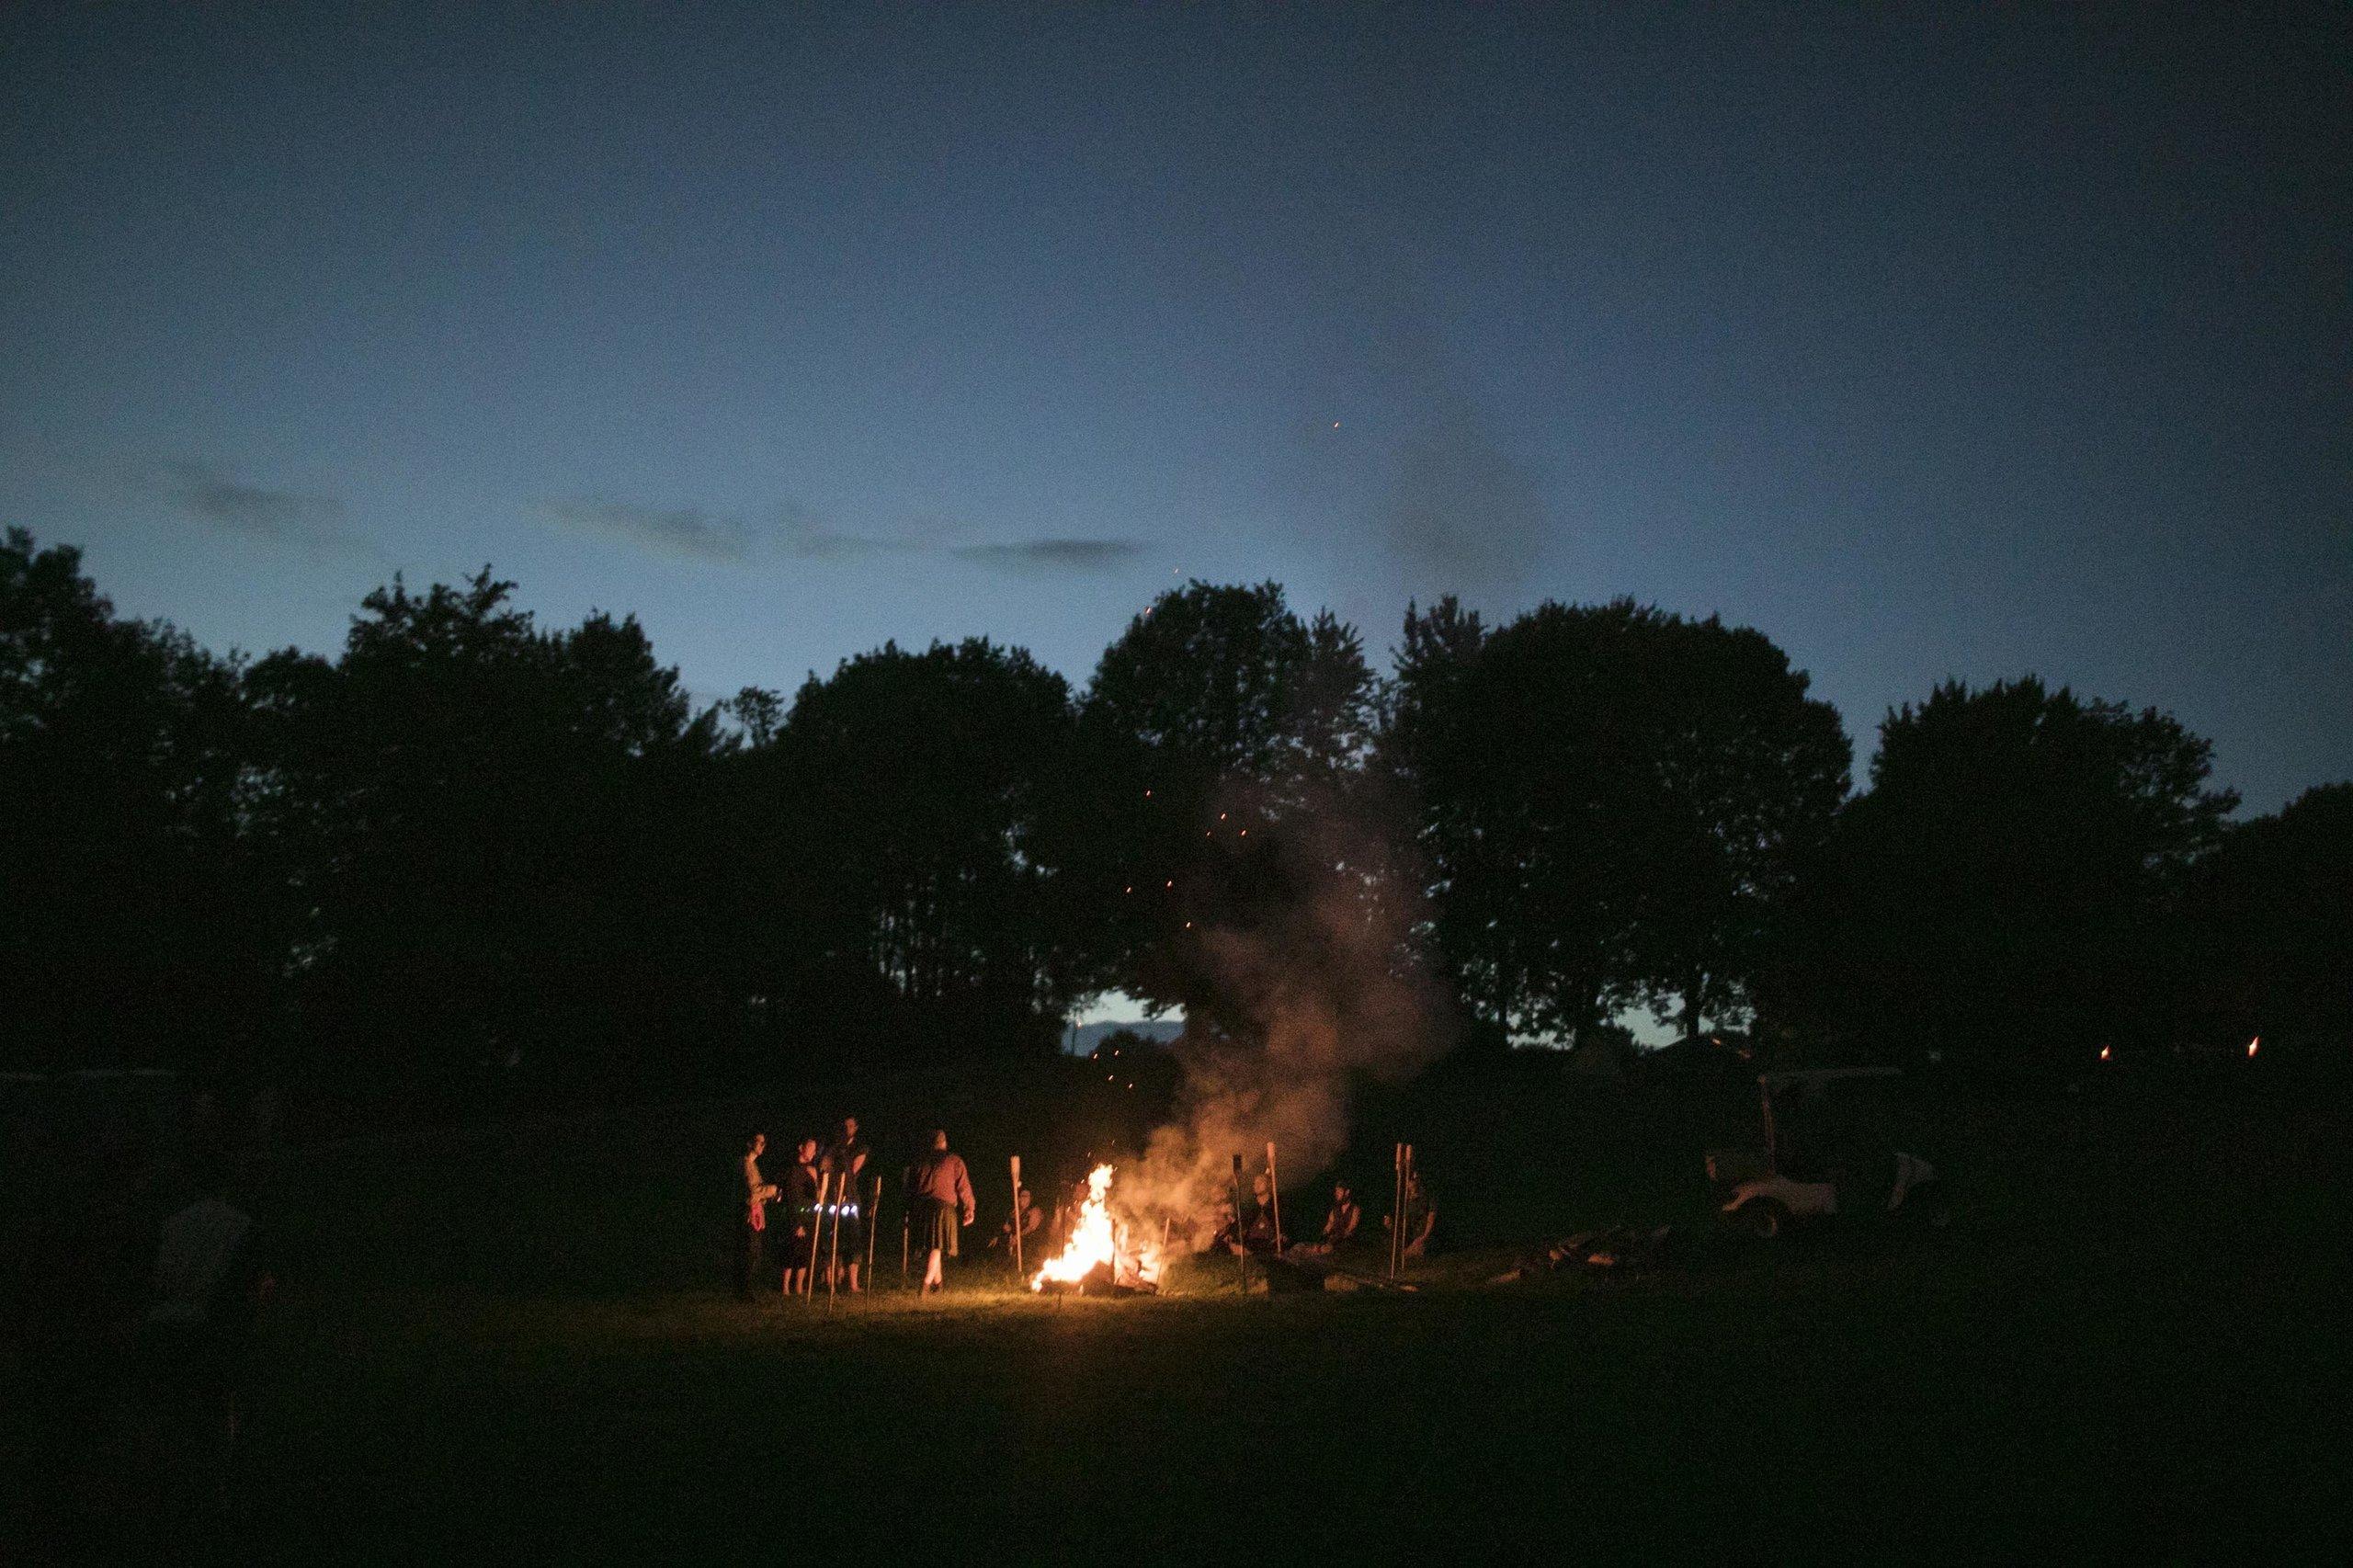 A bonfire rages after dark at Ragnarok.